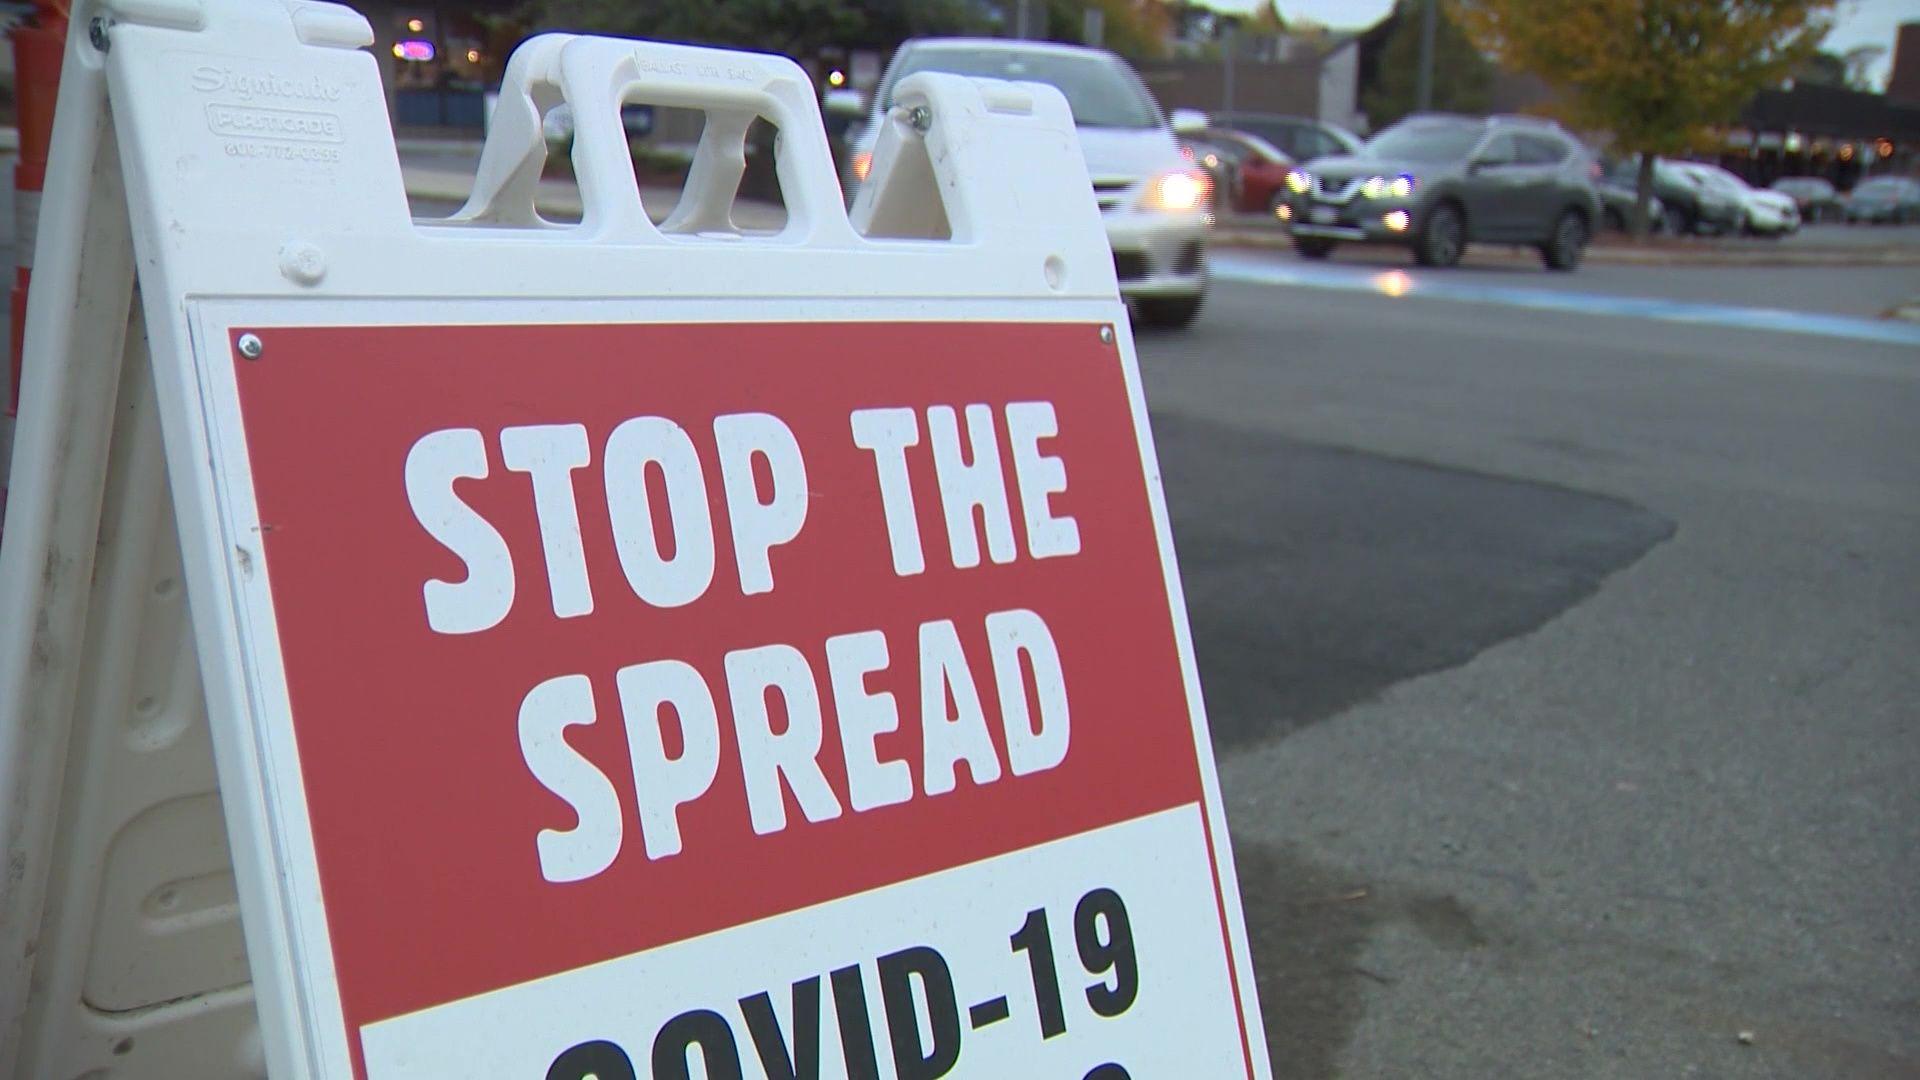 New push to expand COVID-19 testing across Massachusetts